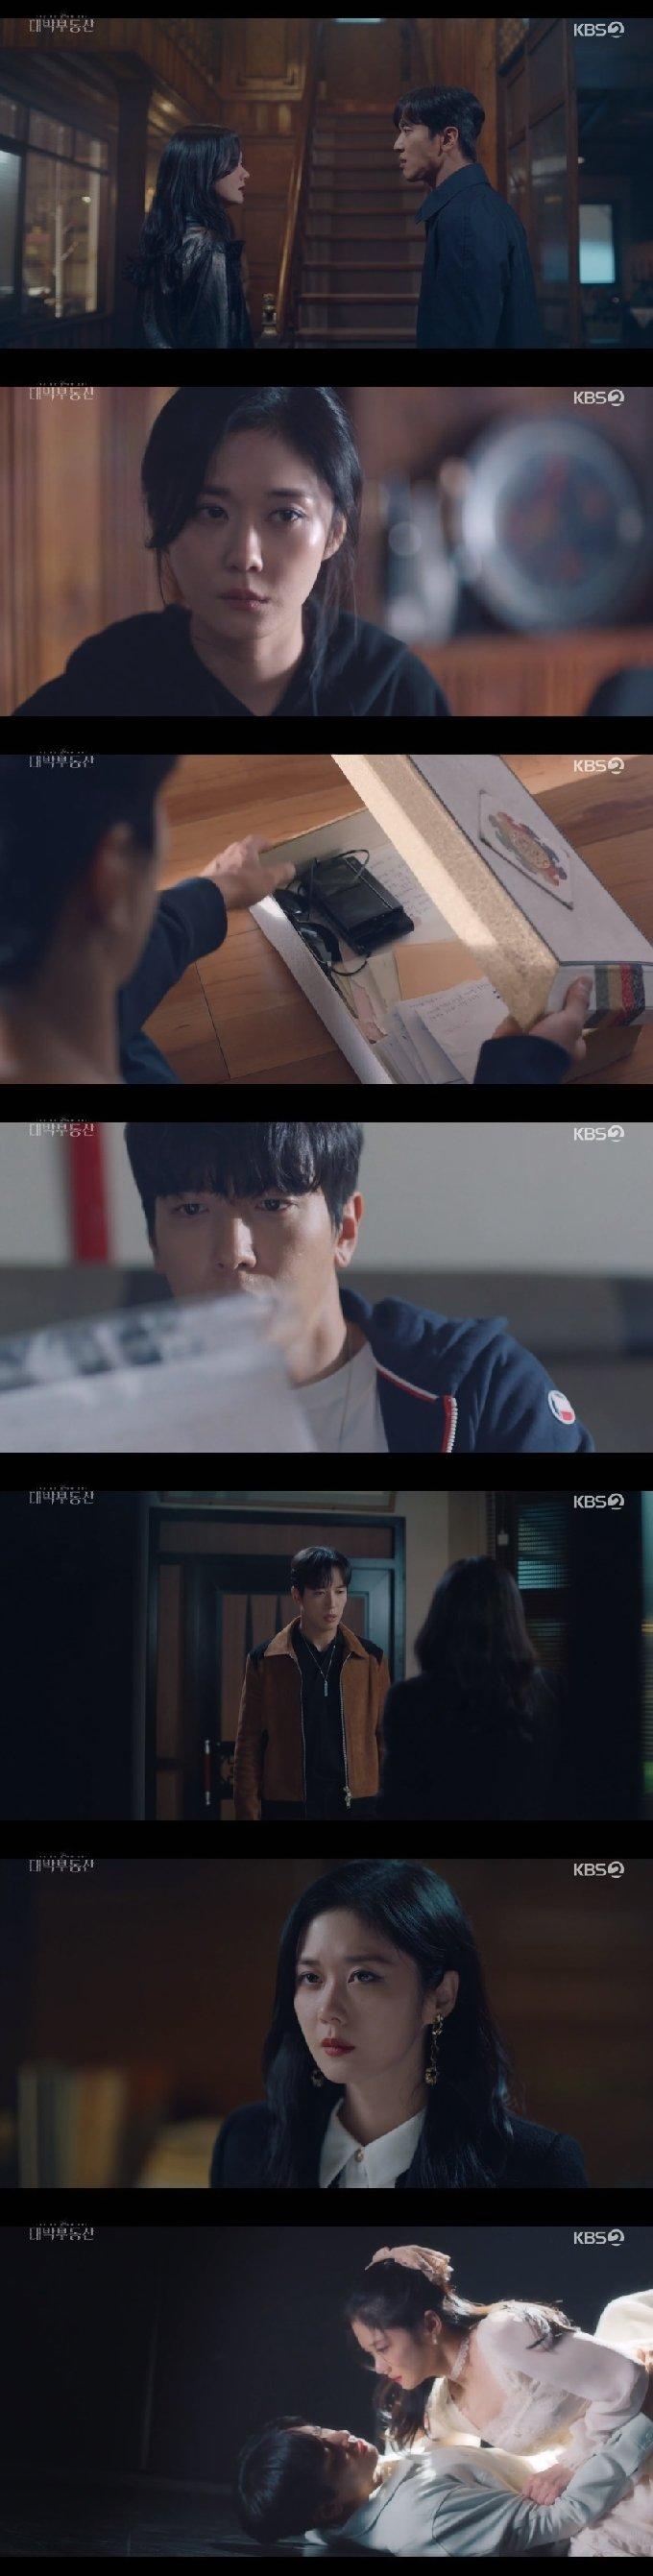 KBS 2TV '대박부동산' 캡처 © 뉴스1